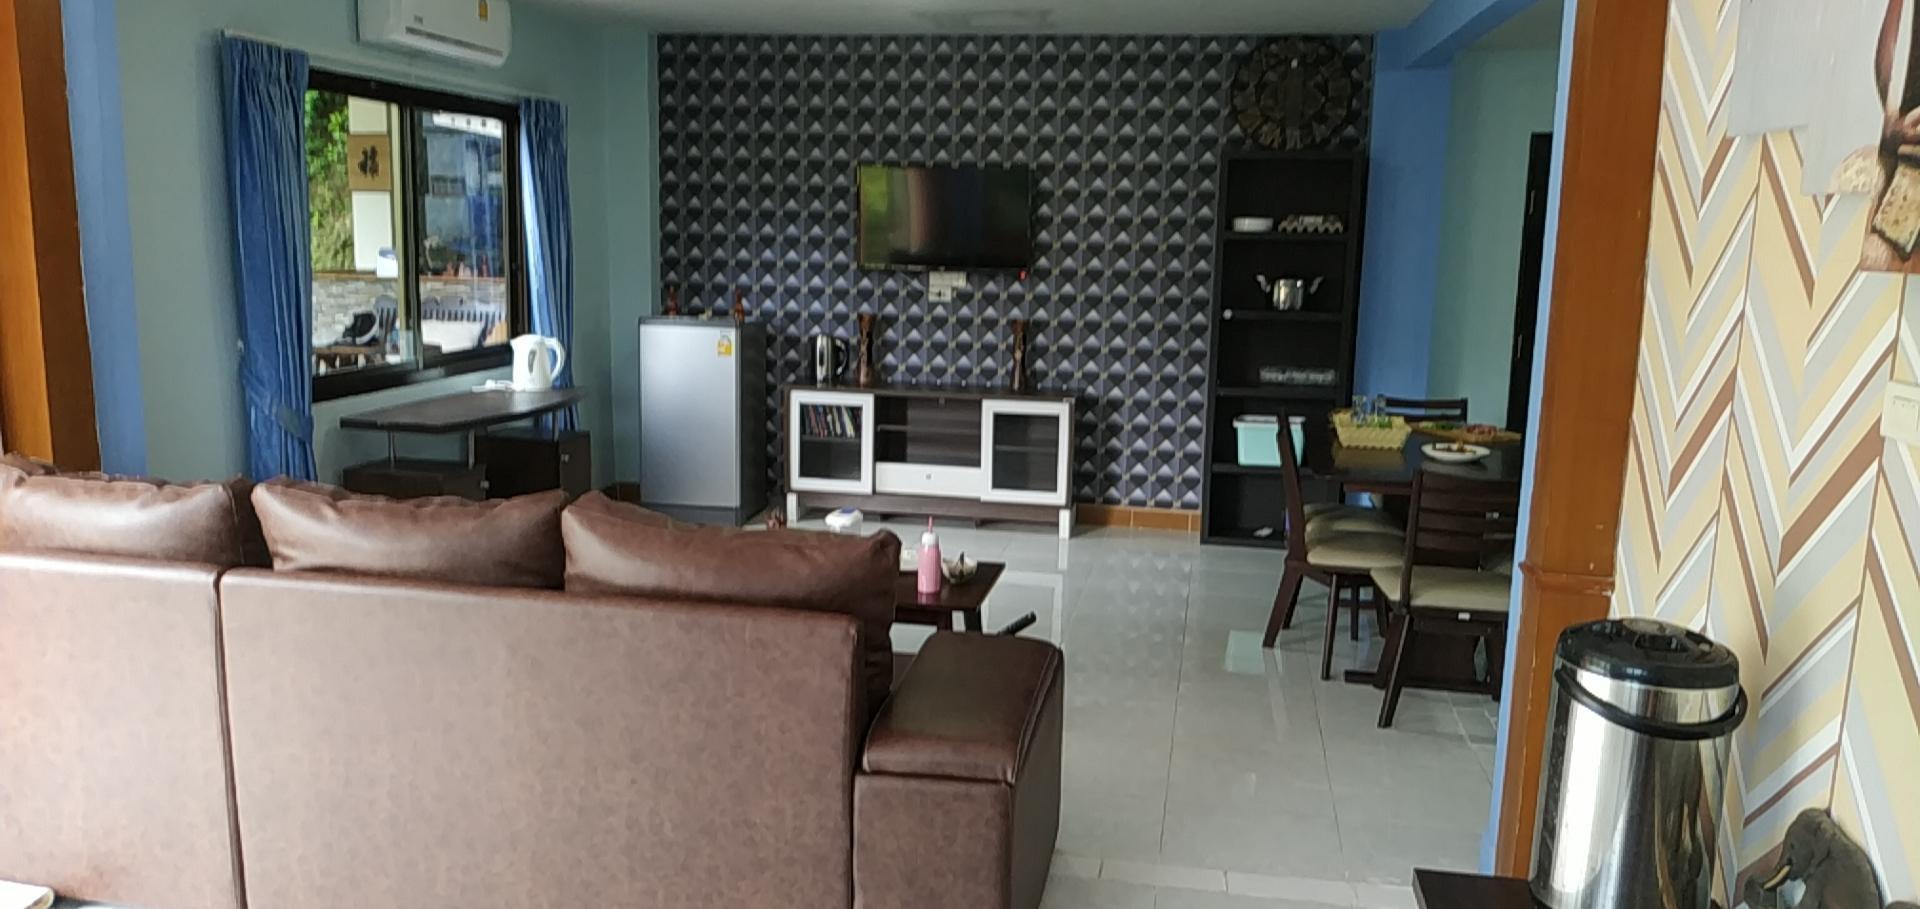 DS villa  Family suite, Patong Beach-12 อพาร์ตเมนต์ 3 ห้องนอน 3 ห้องน้ำส่วนตัว ขนาด 160 ตร.ม. – ป่าตอง